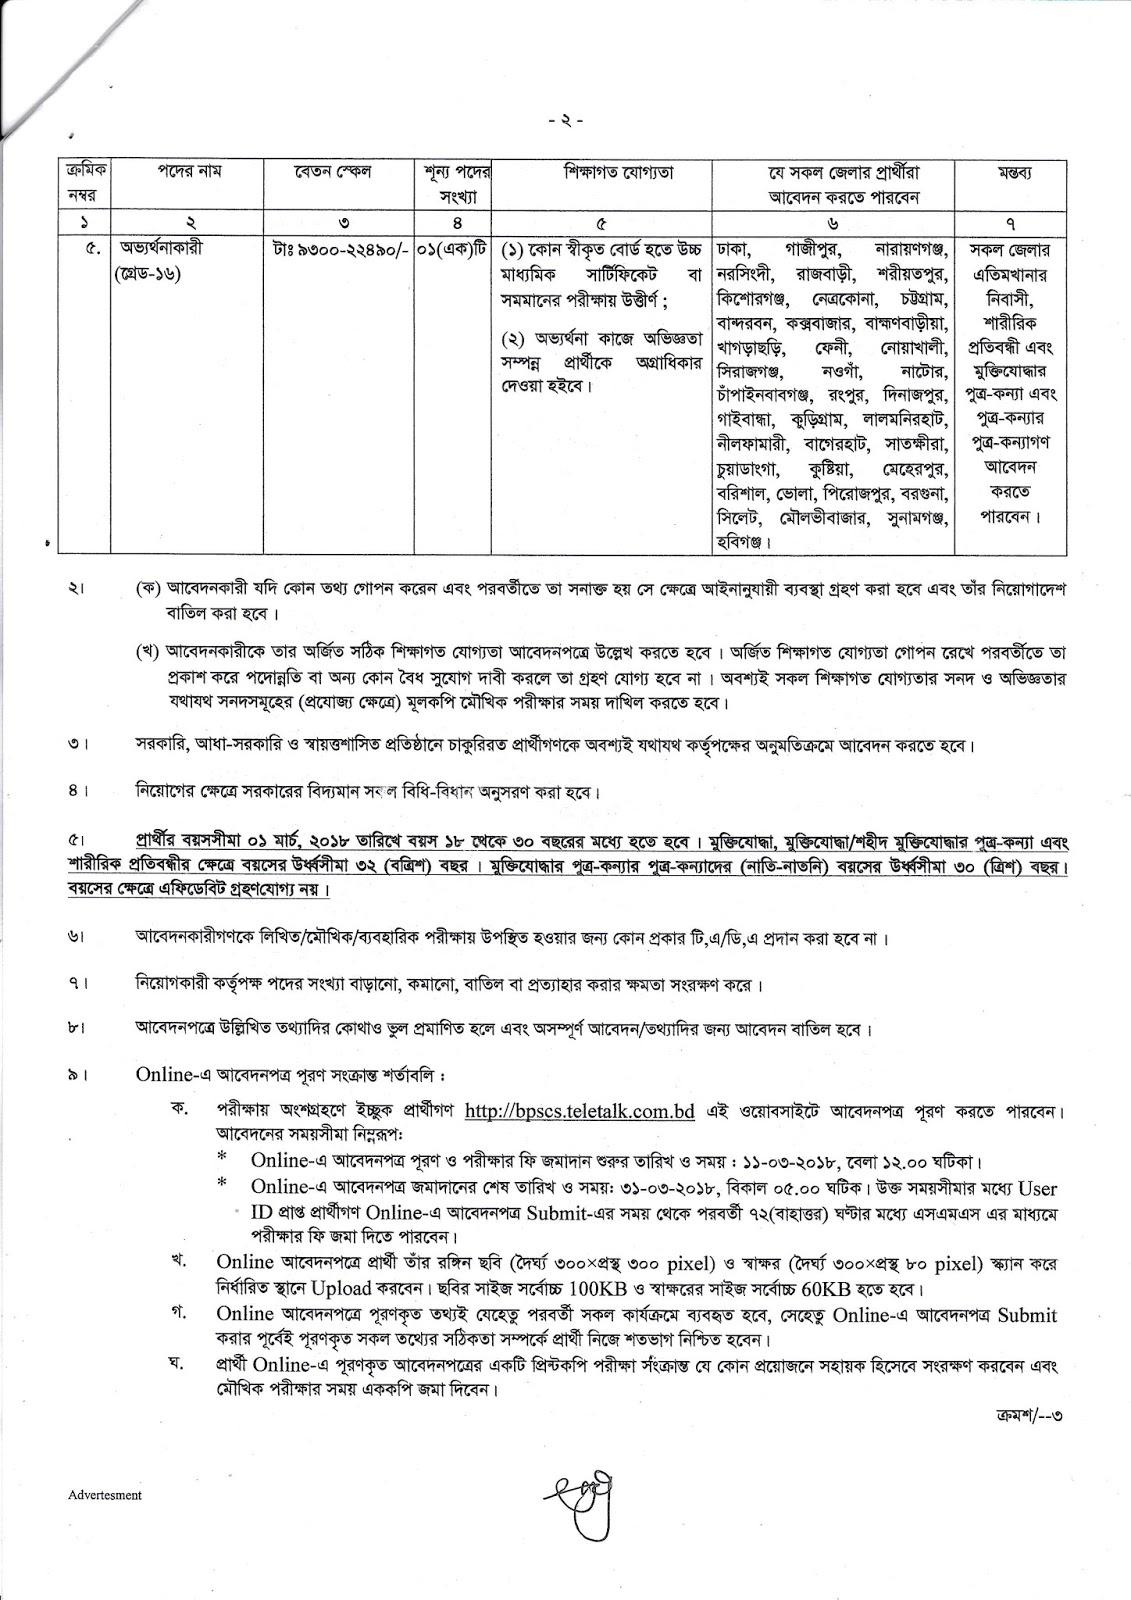 BPSC Secretariat Office Job Circular 2018